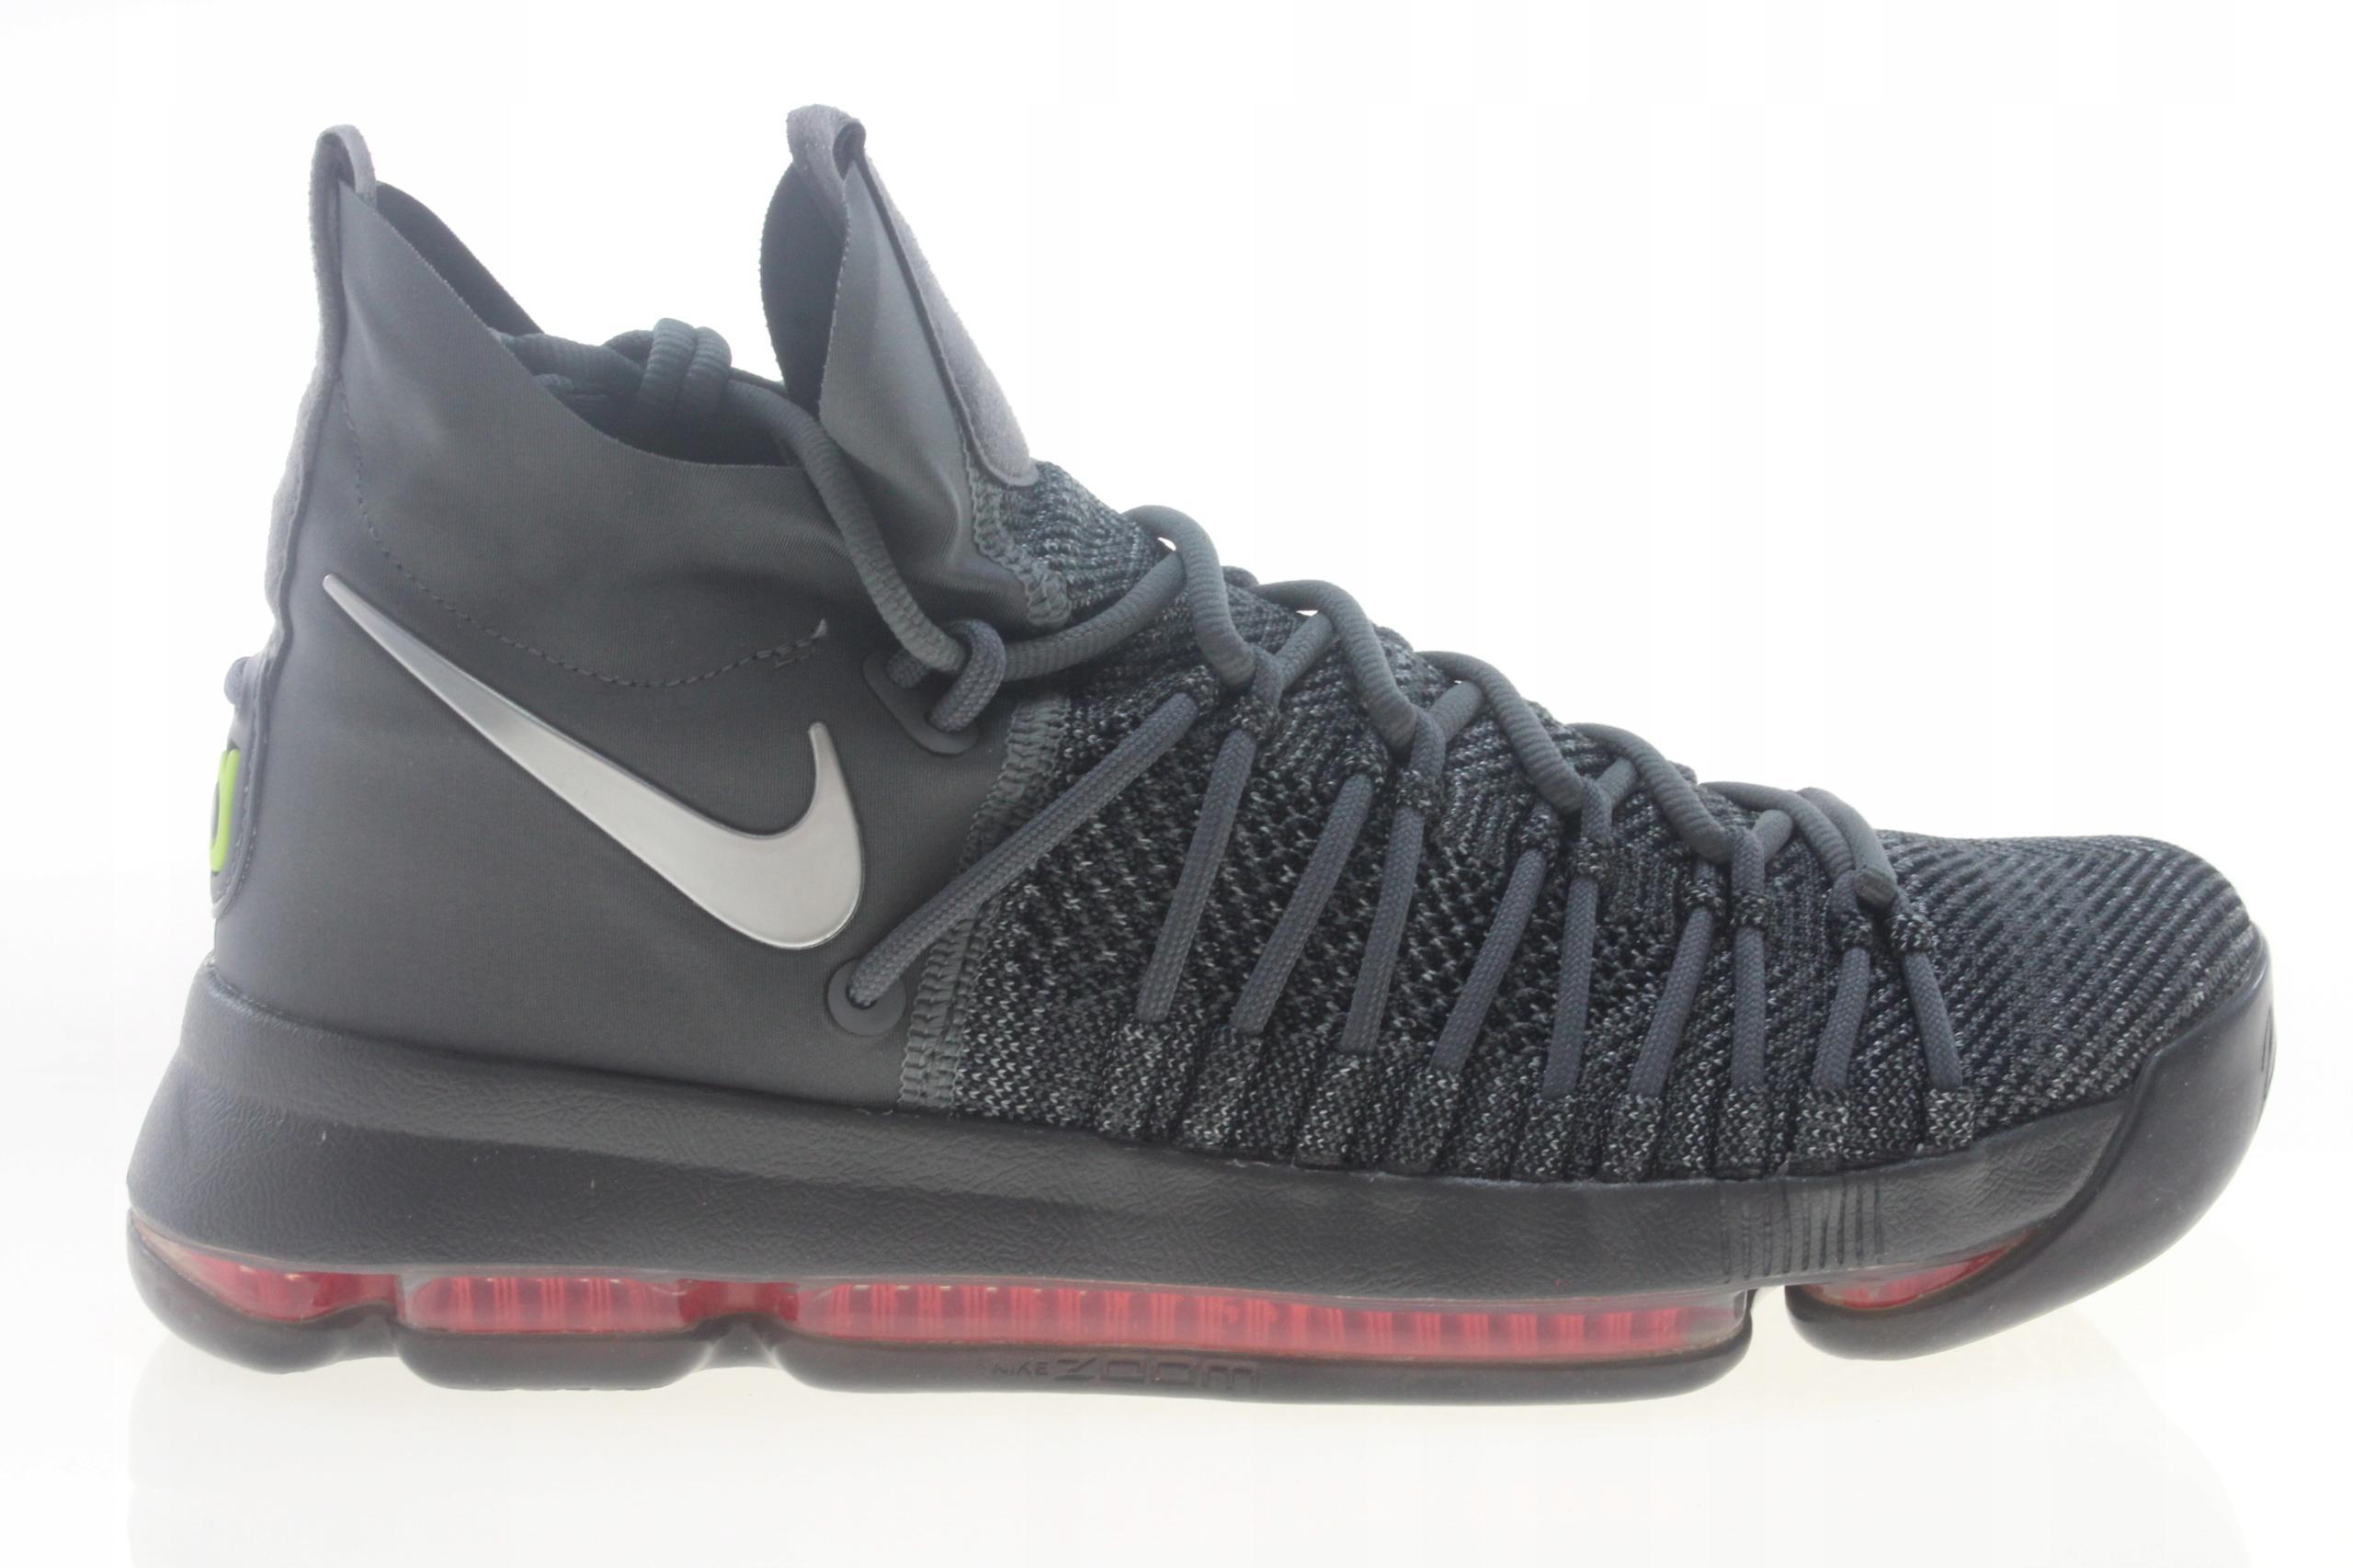 new product 458a5 f4123 Buty męskie Nike Zoom Kd 9 Elite Time To Shine (7617018204)